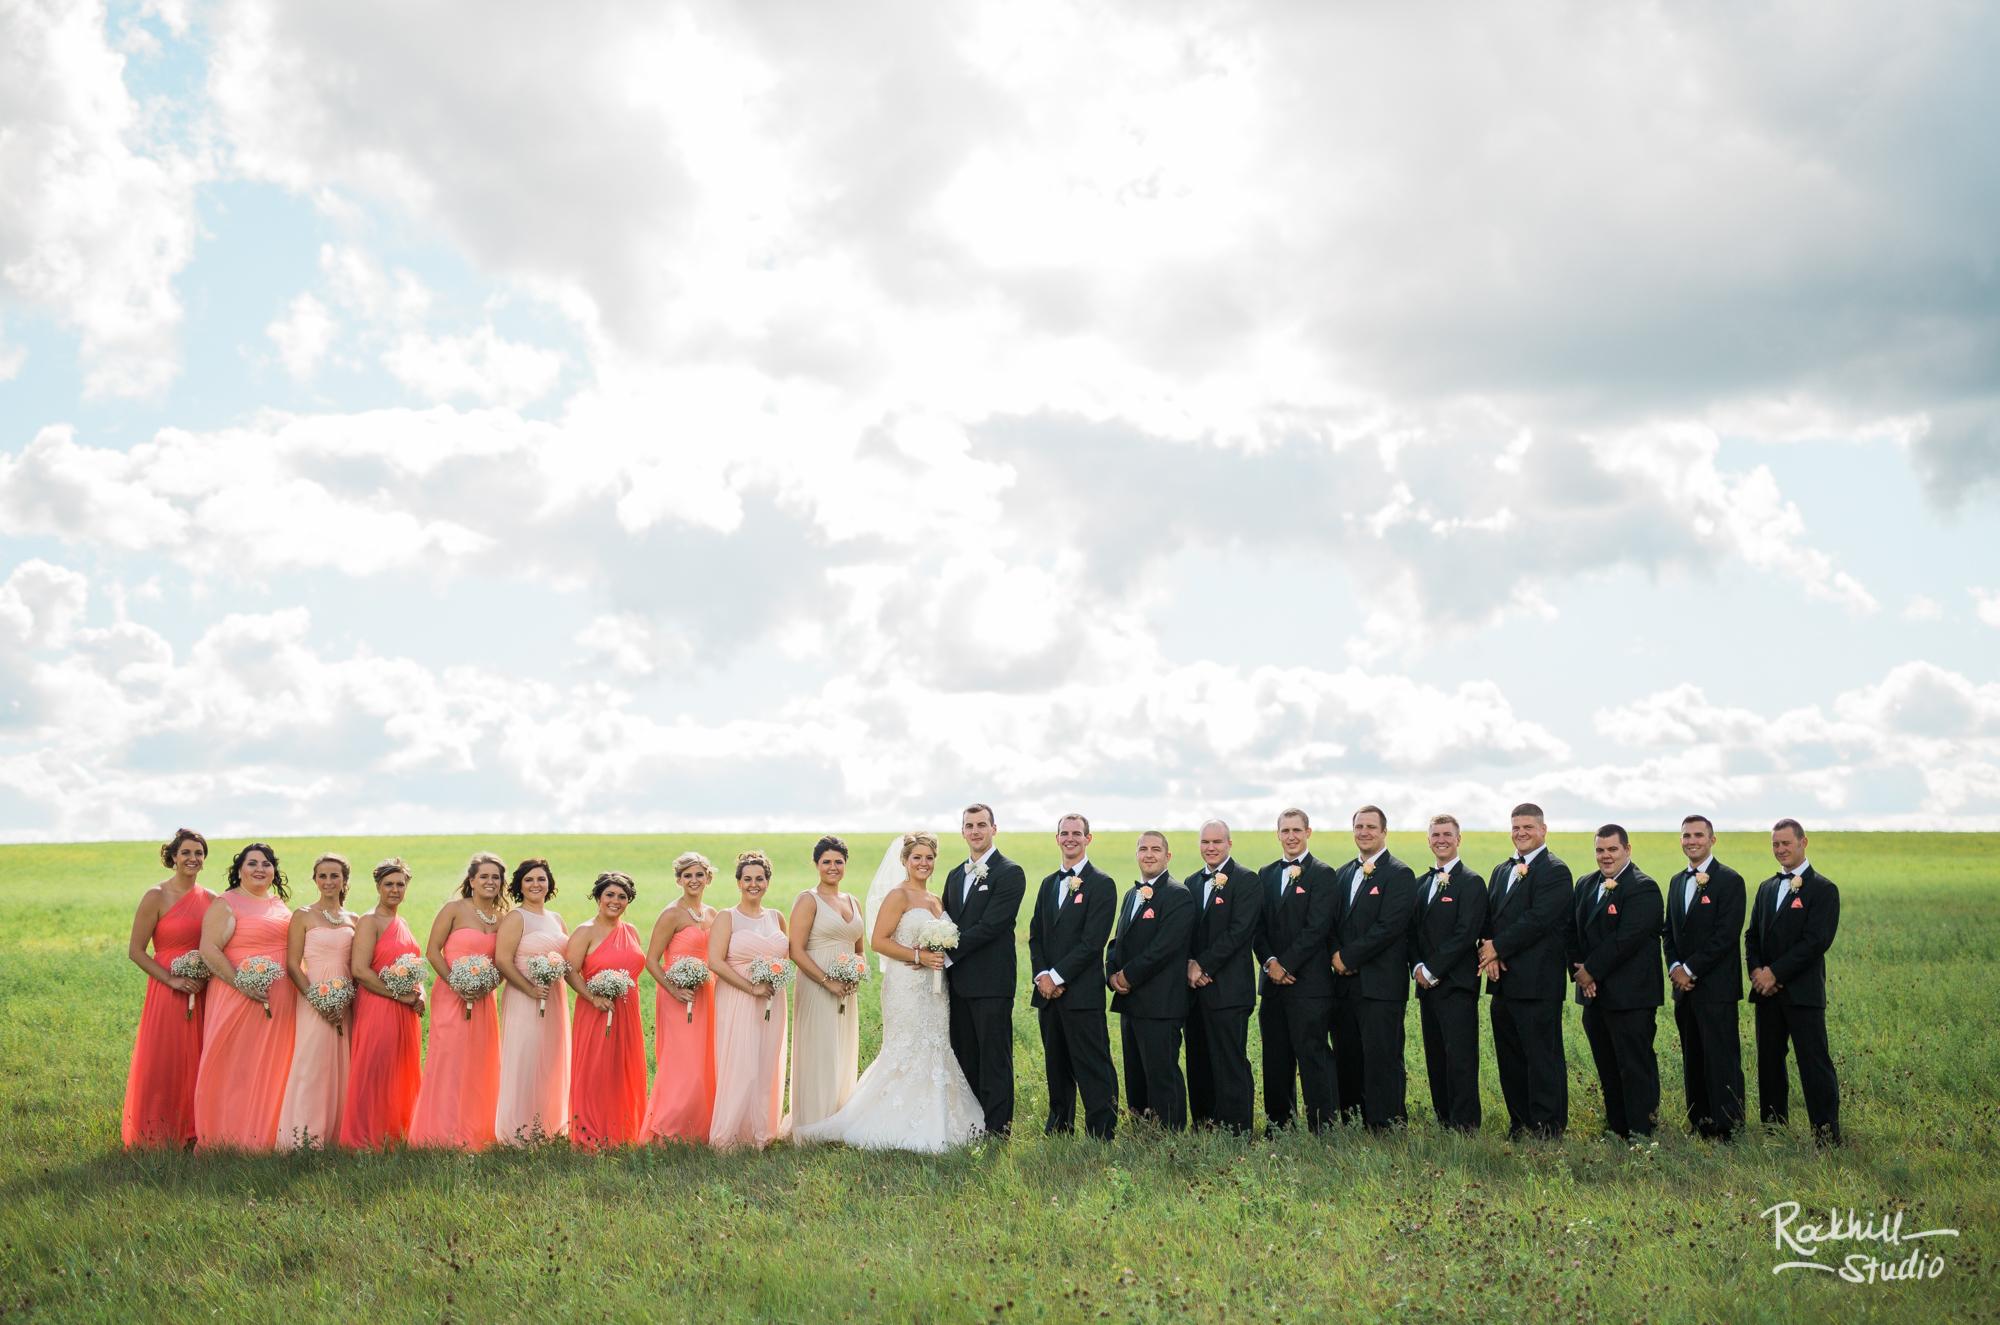 rockhill-studio-marquette-michigan-upper-peninsula-wedding-large-party-field-portrait-photographer.jpg